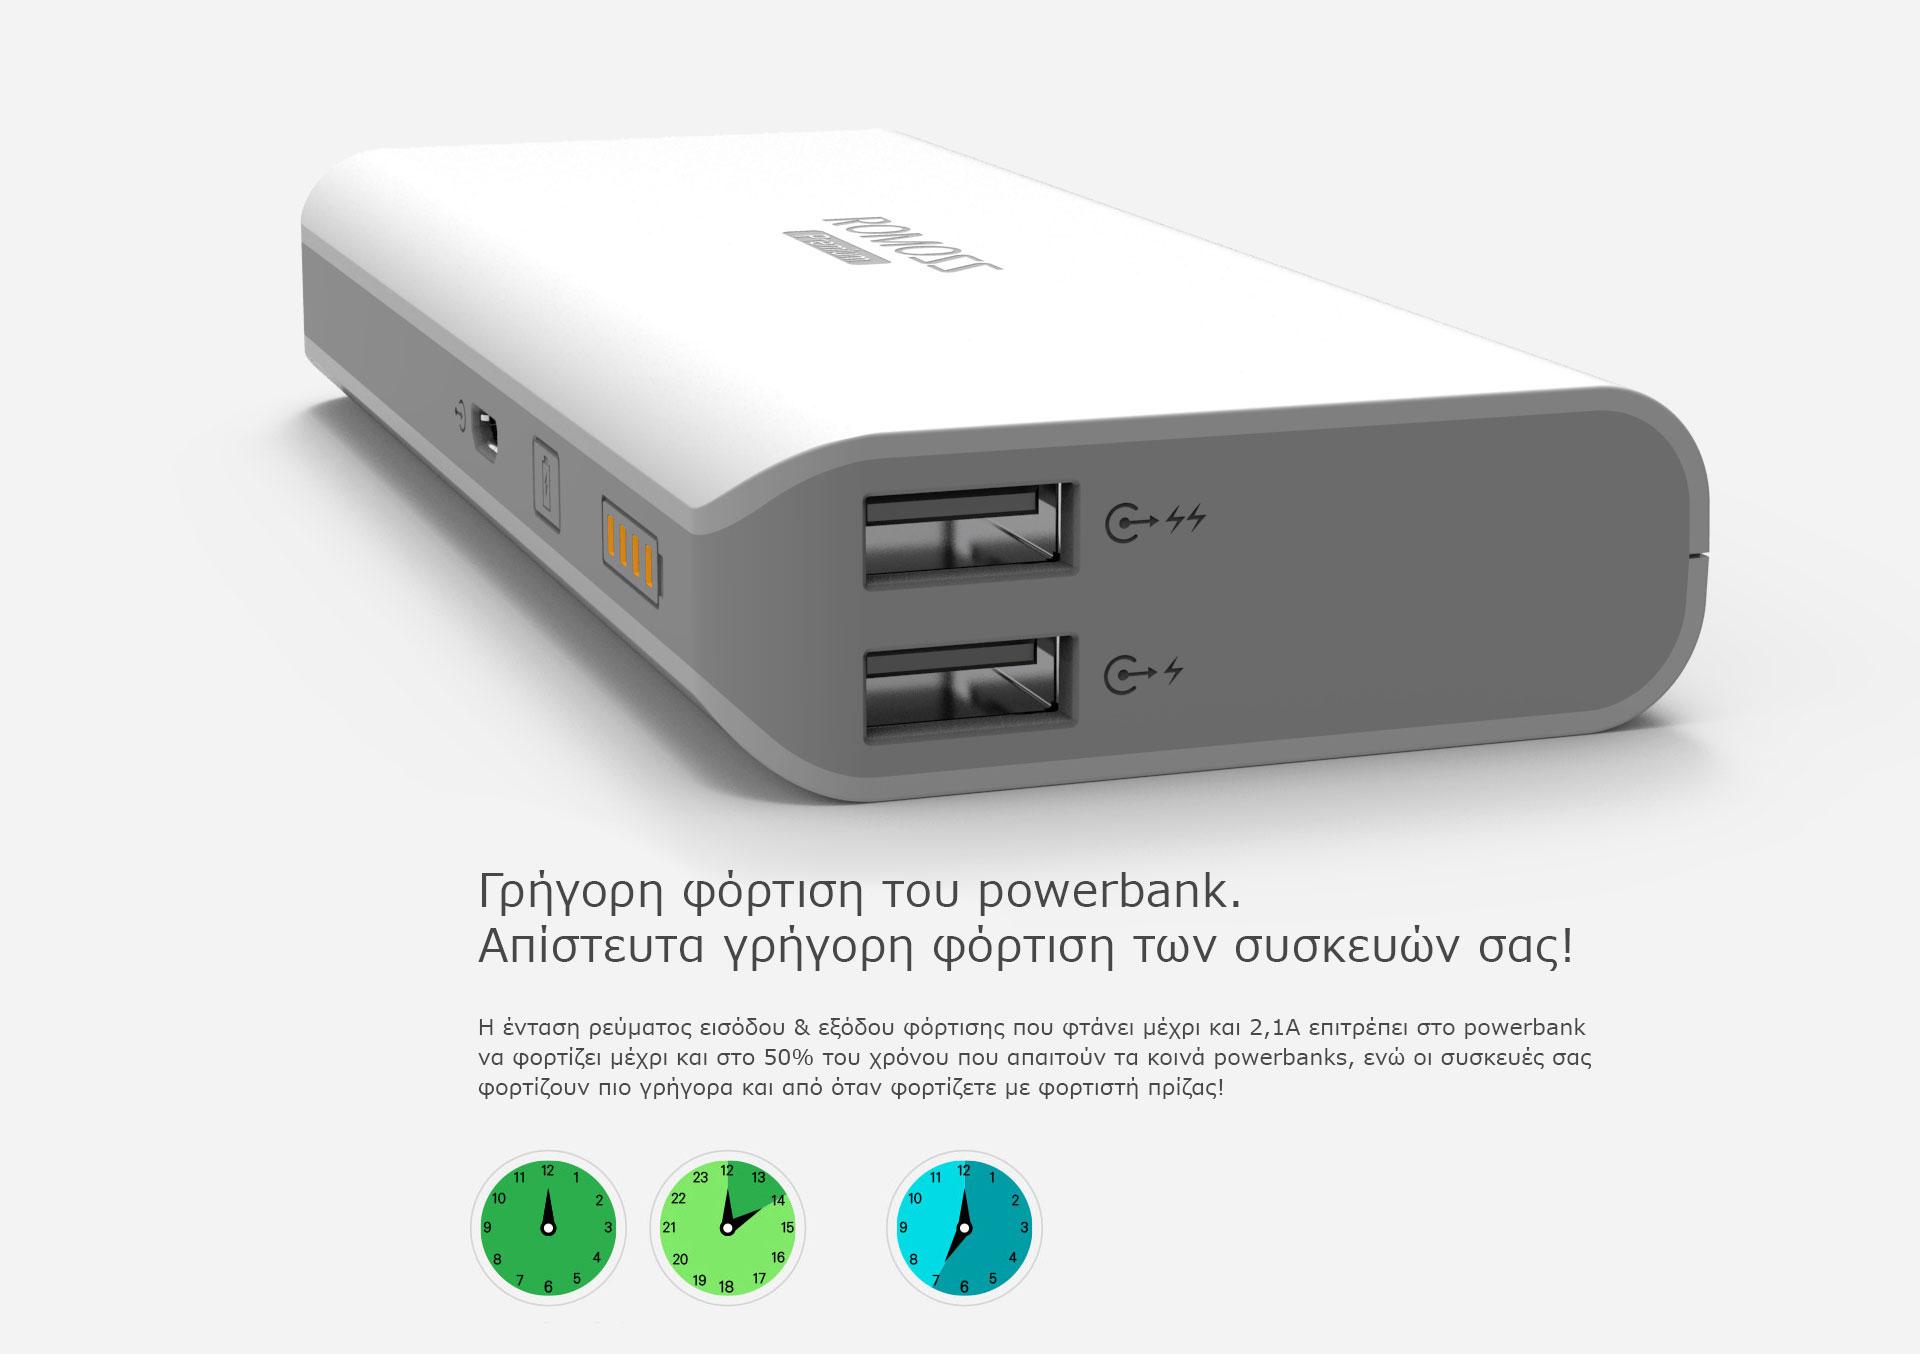 romoss-powerbanks-texnologia2